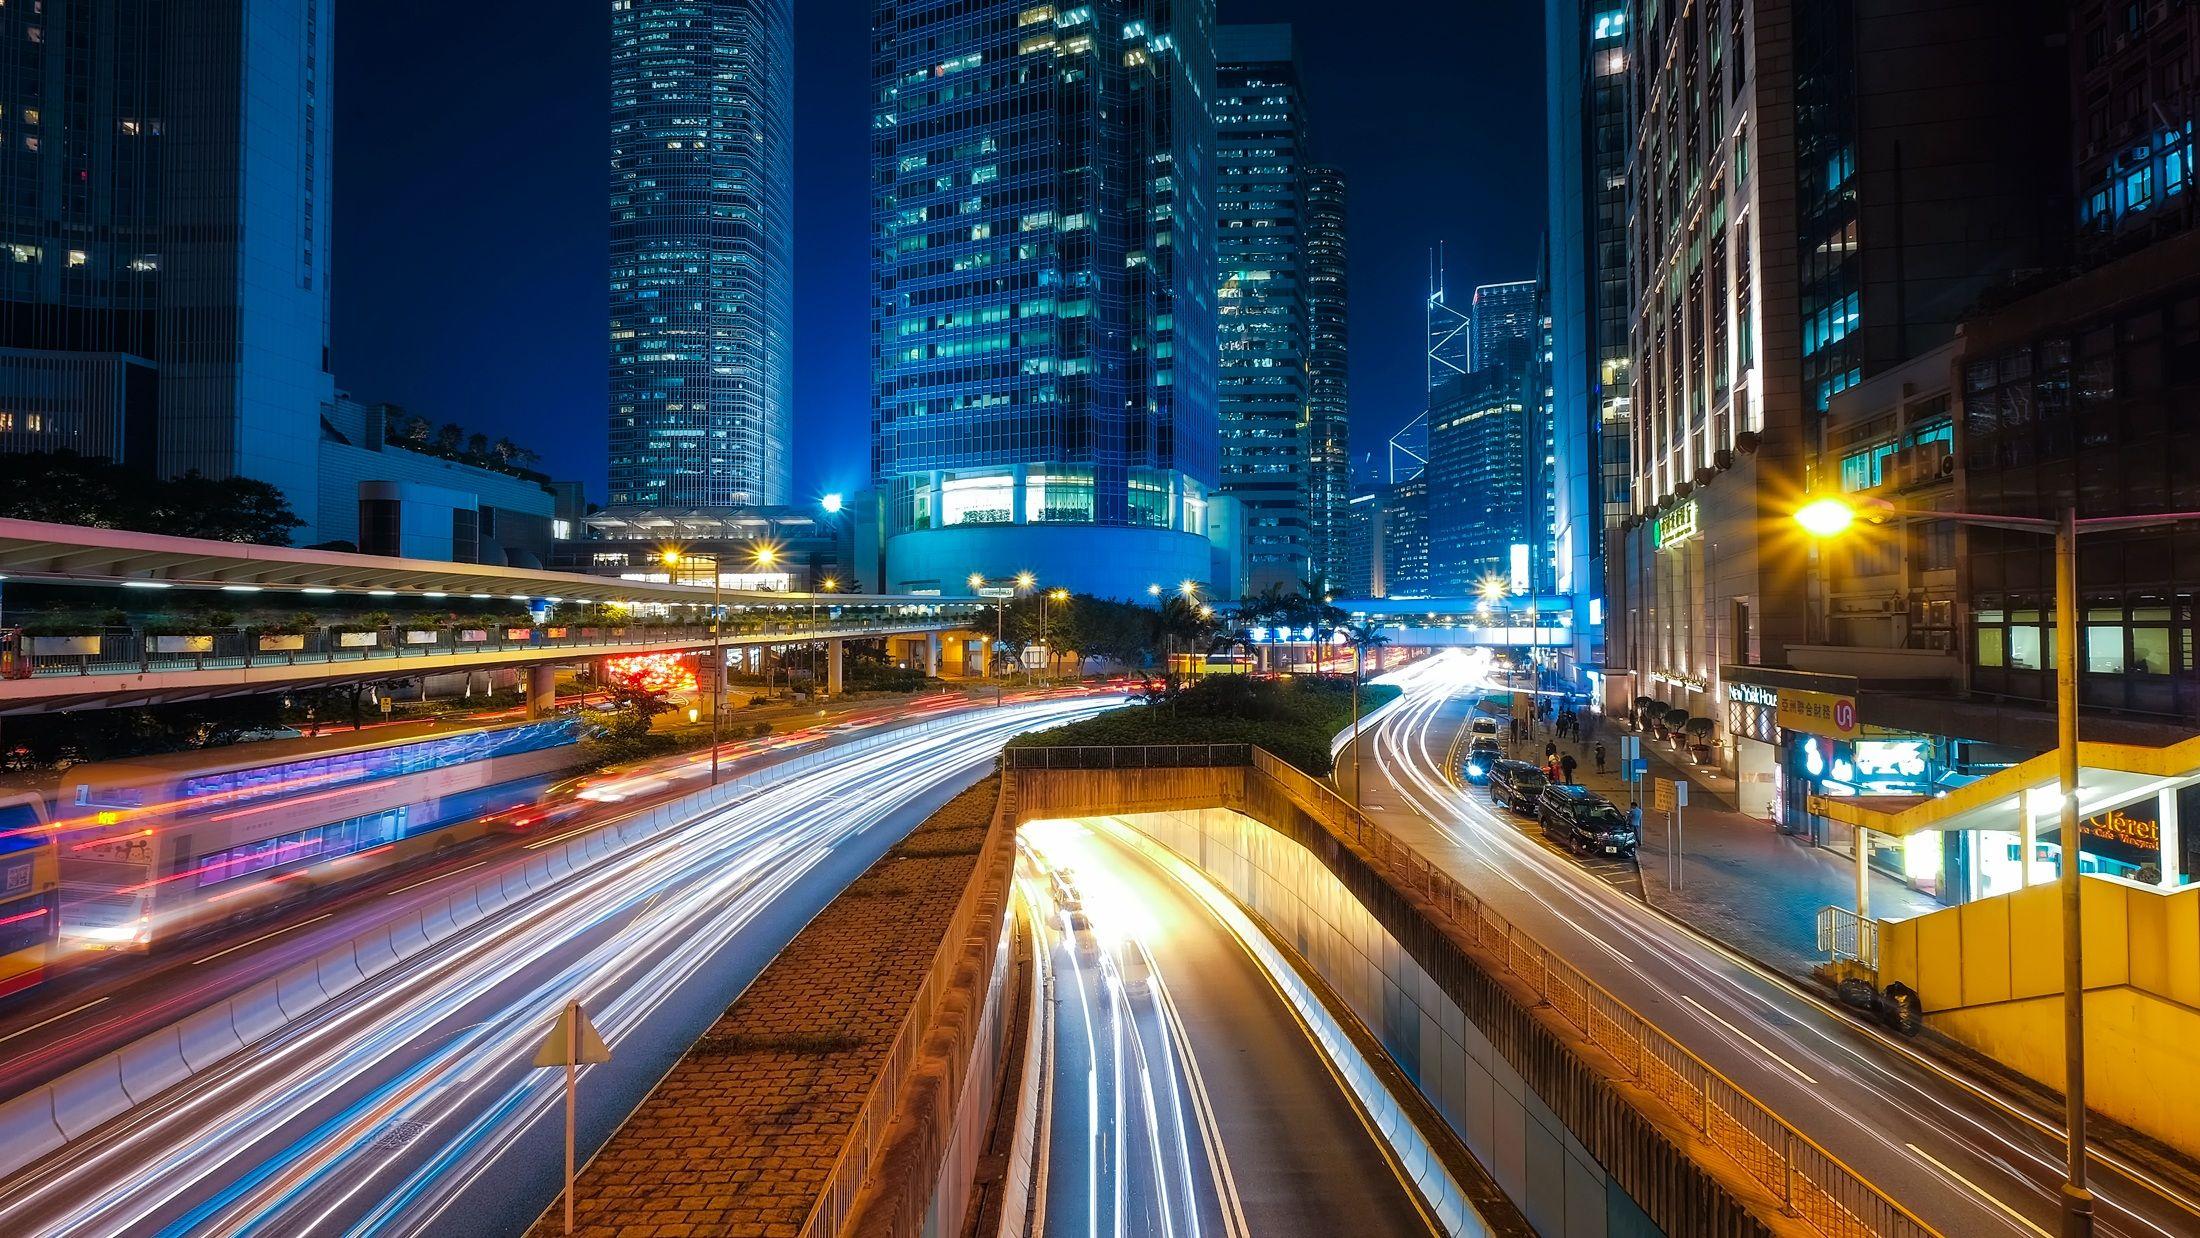 Cidades Inteligentes E O Futuro Da Vida Urbana